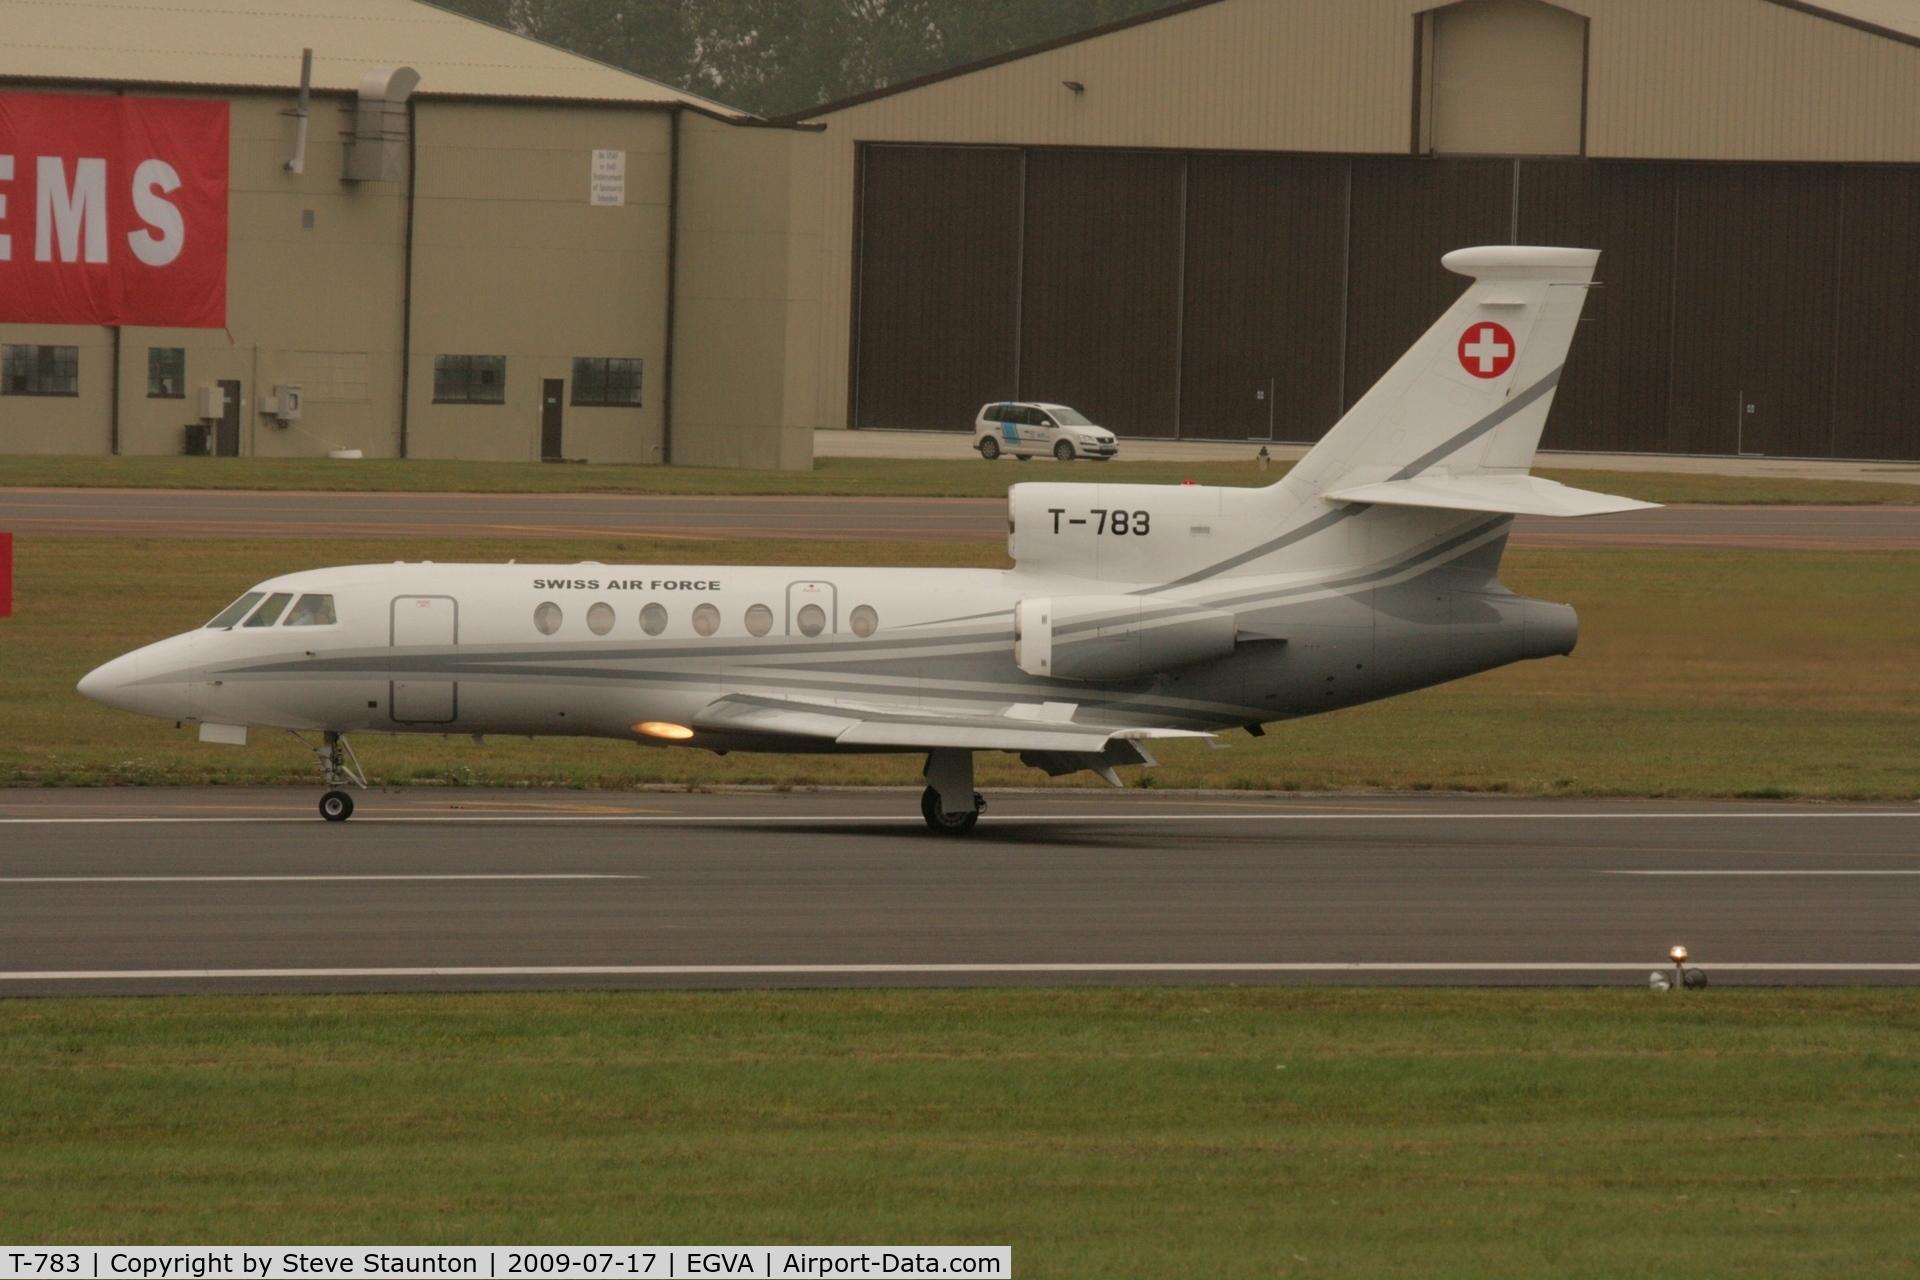 T-783, Dassault Falcon 50 C/N 67, Taken at the Royal International Air Tattoo 2009